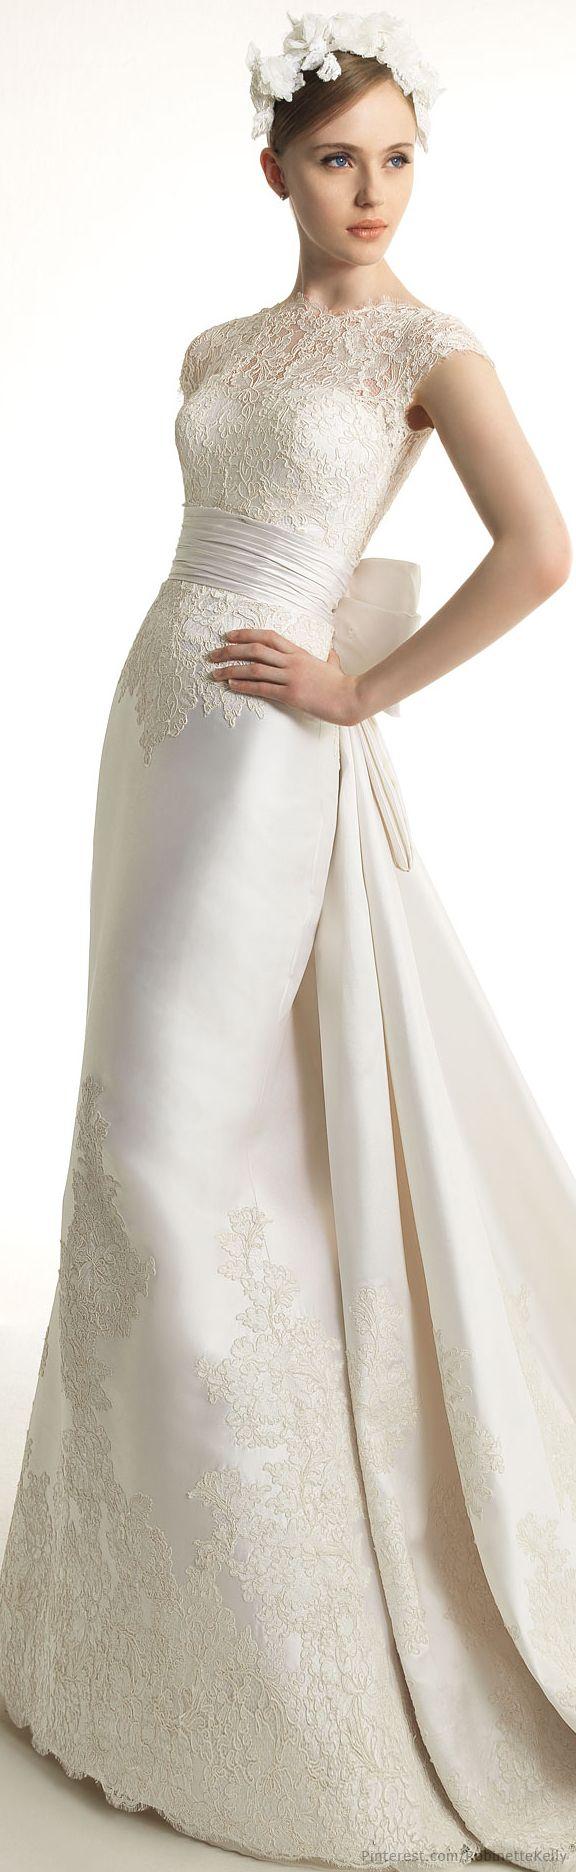 Zuhair Murad for Rosa Clará | Bridal ♦F&I♦